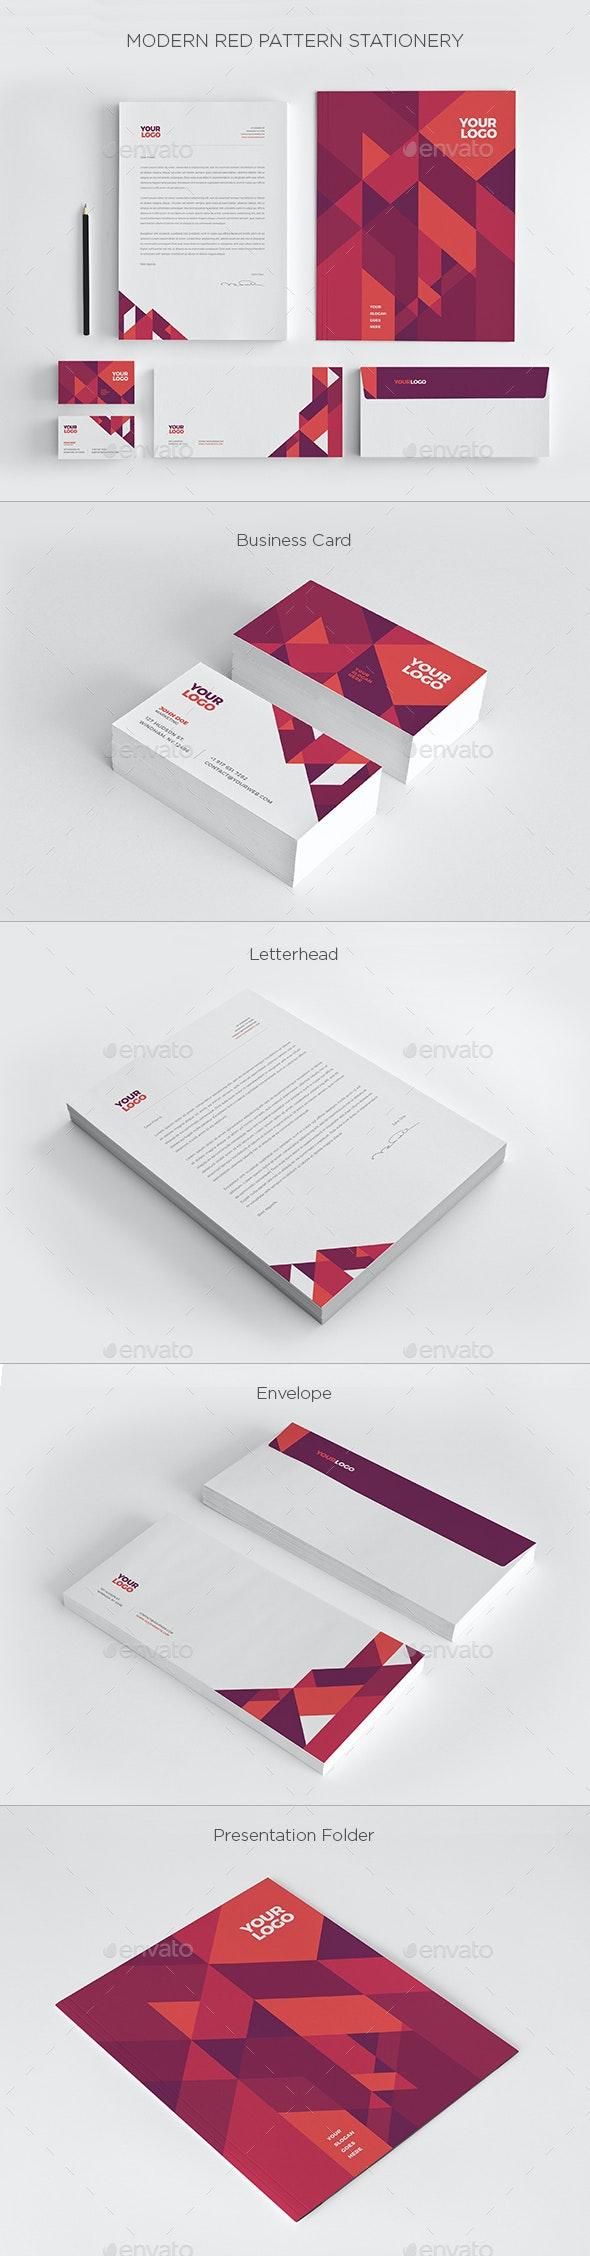 Modern Red Pattern Stationery - Stationery Print Templates